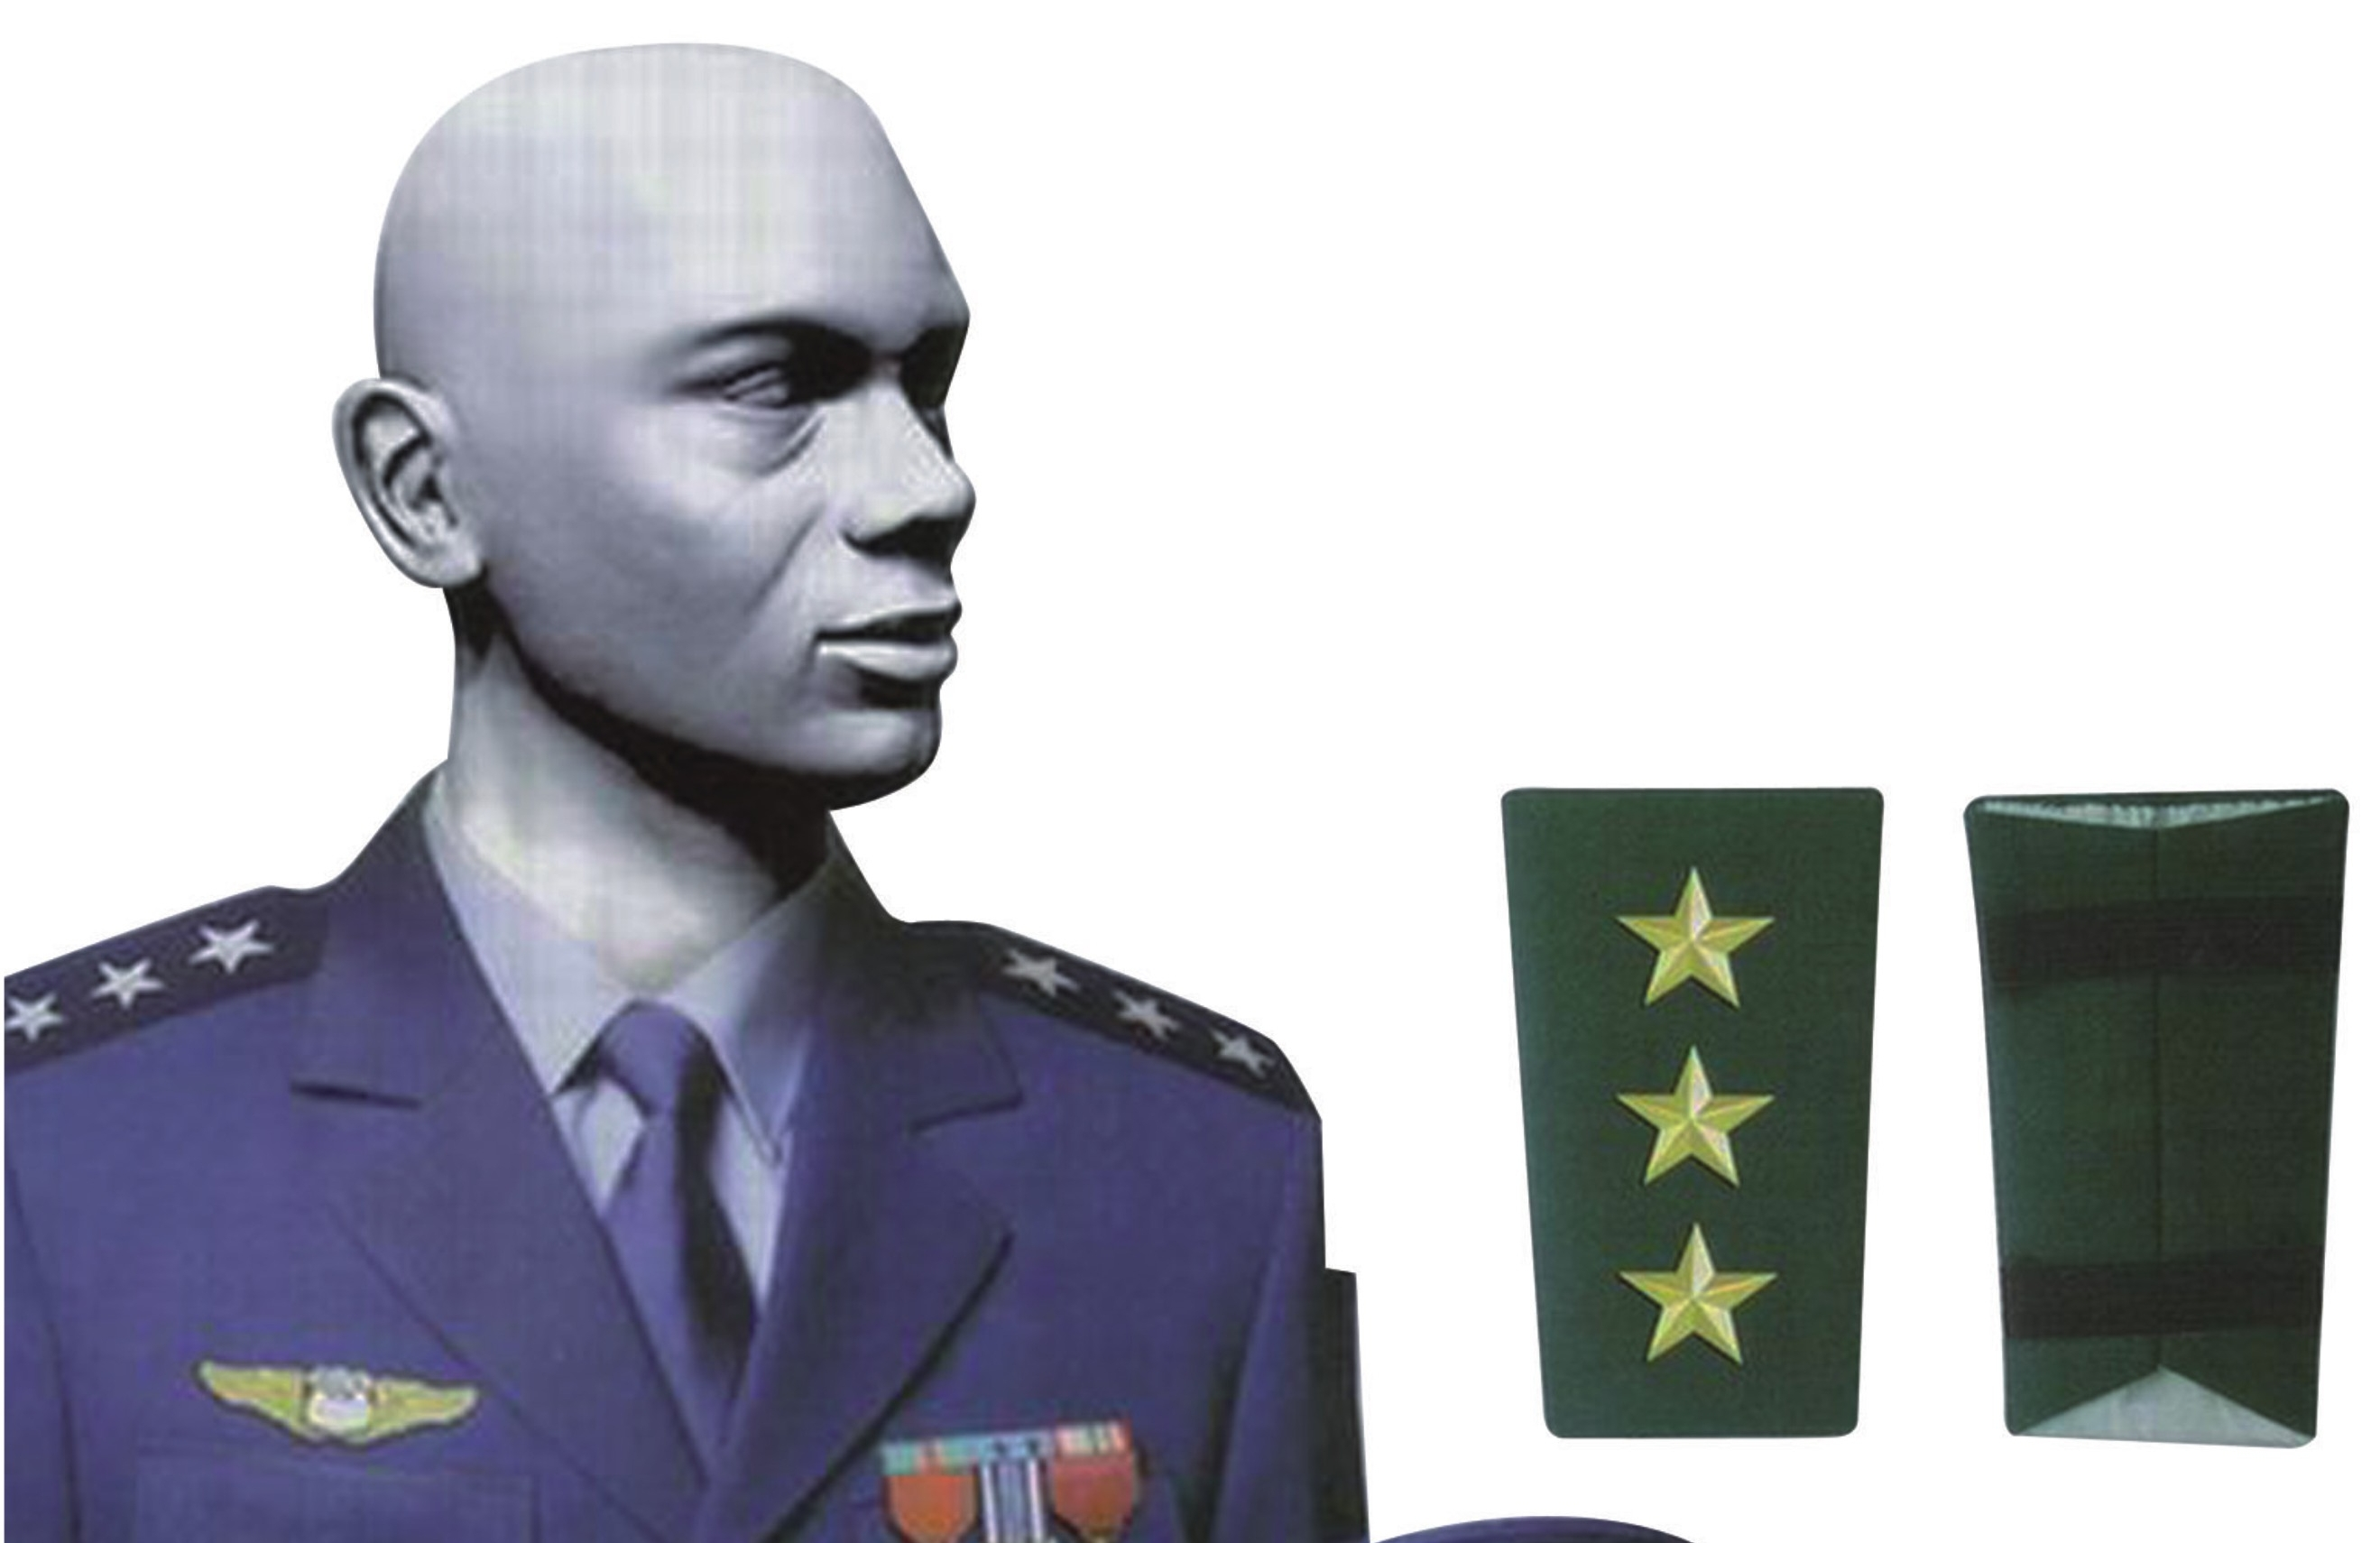 Galones hombro, hombreras militares, epaulettes